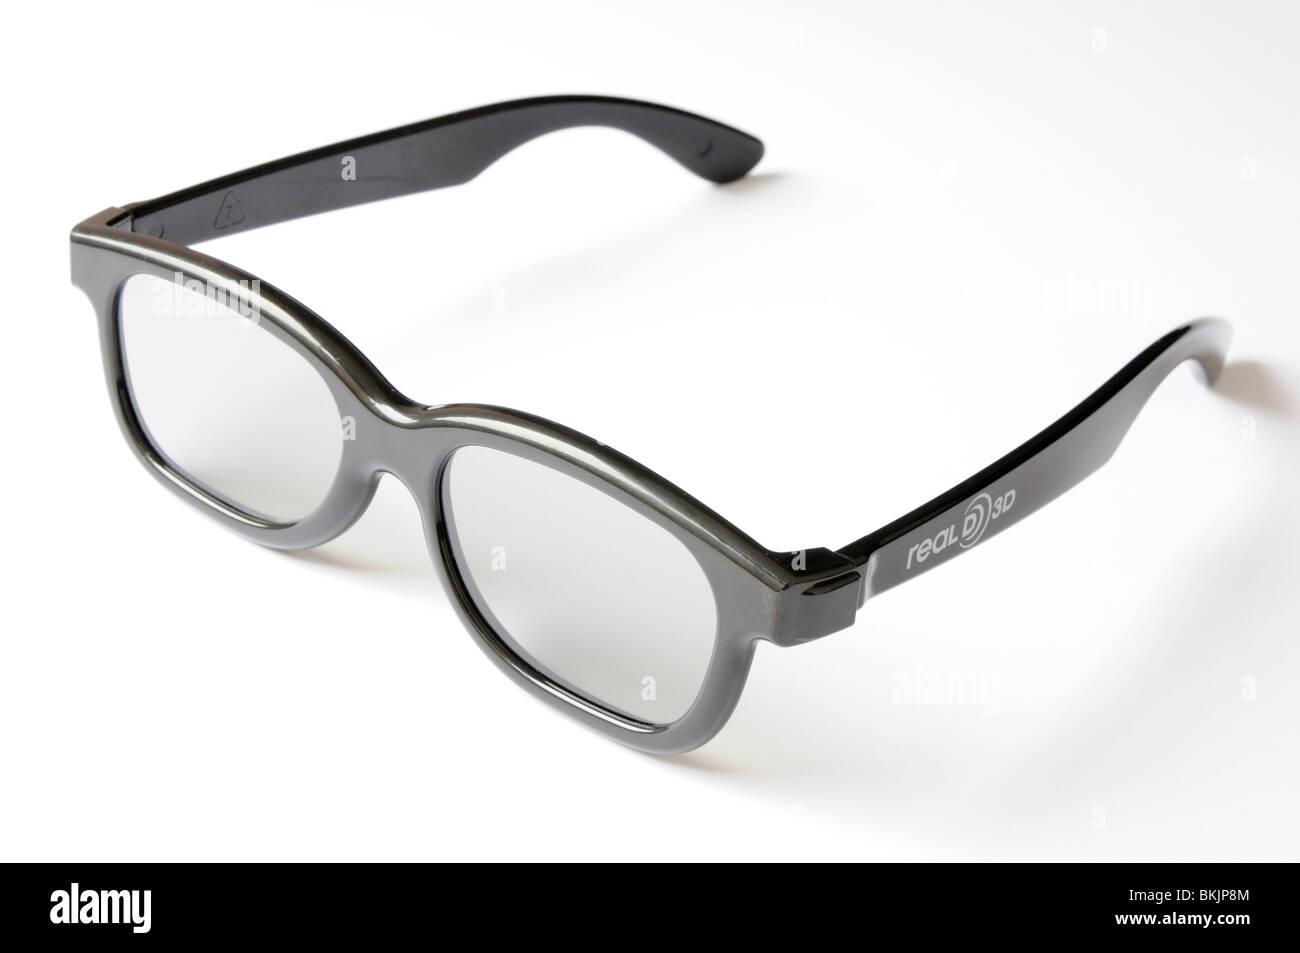 Glasses Specs Stockfotos & Glasses Specs Bilder - Alamy